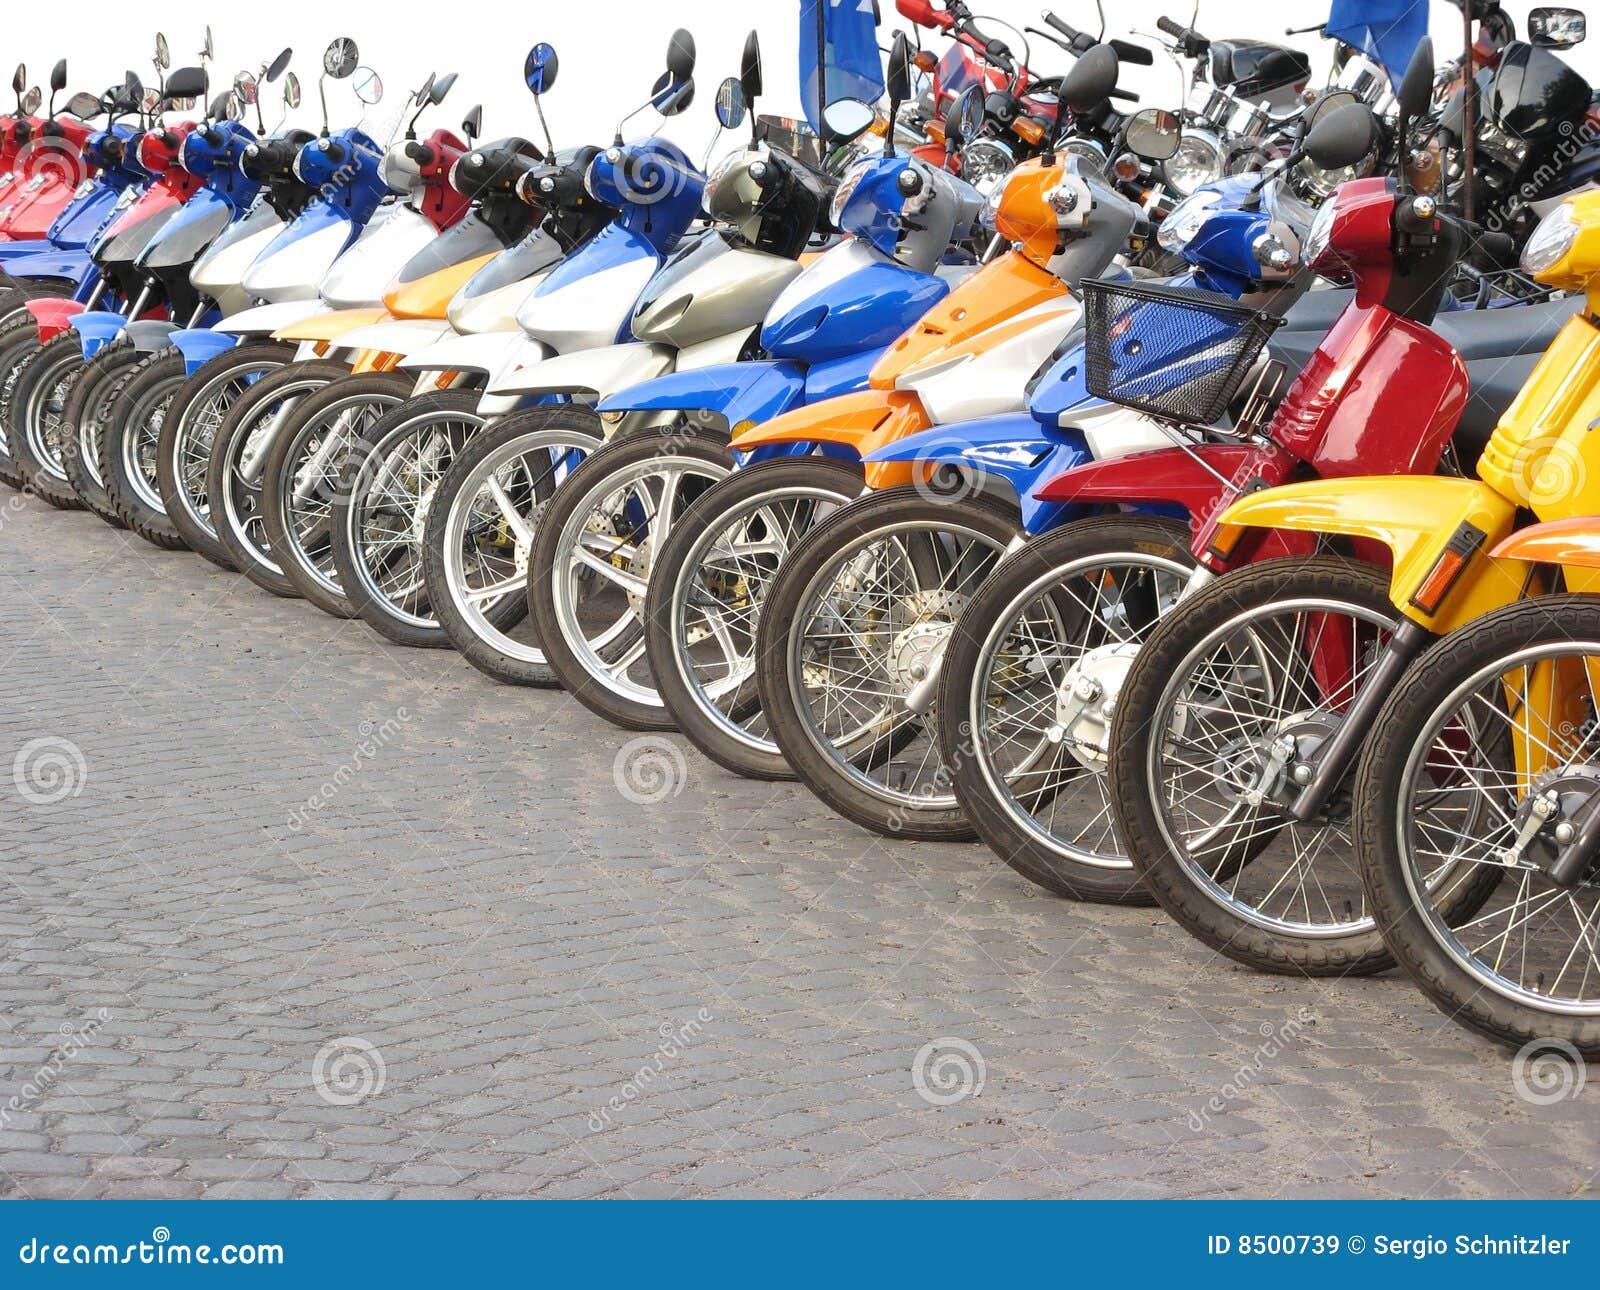 Motocicletas en línea